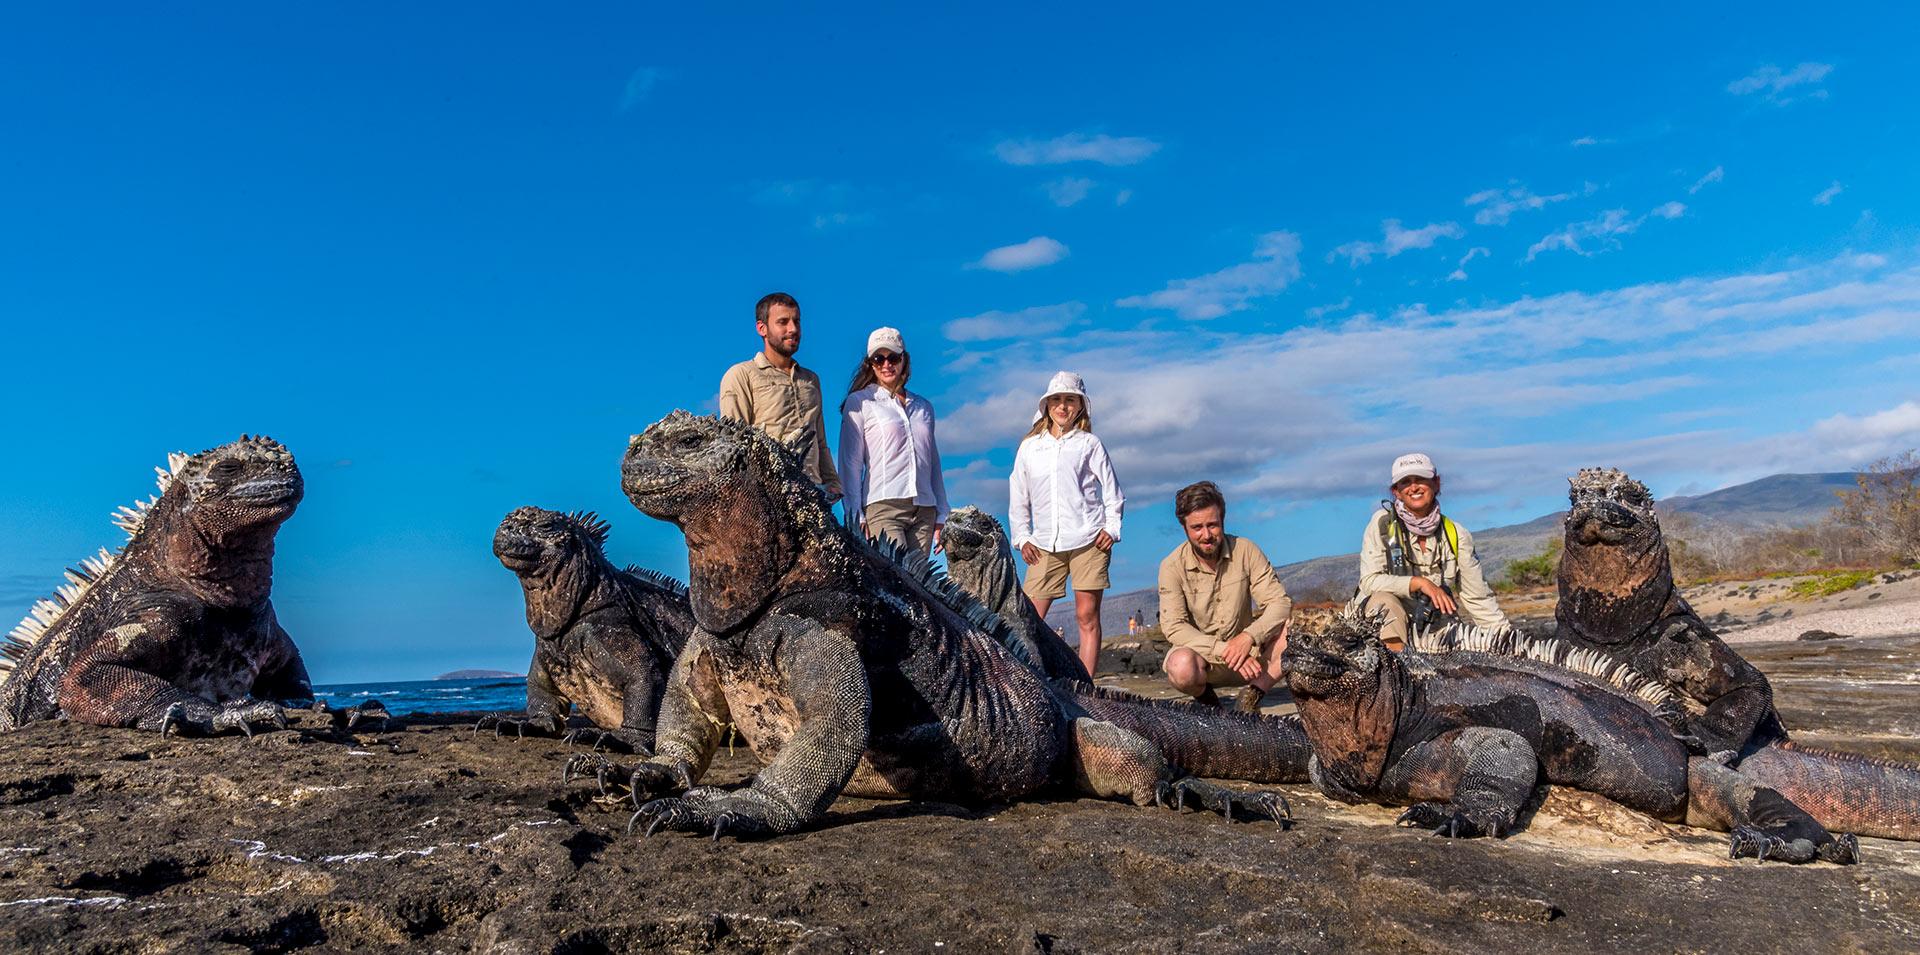 marine-iguanas-posing-tourists-galapagos-ecuador